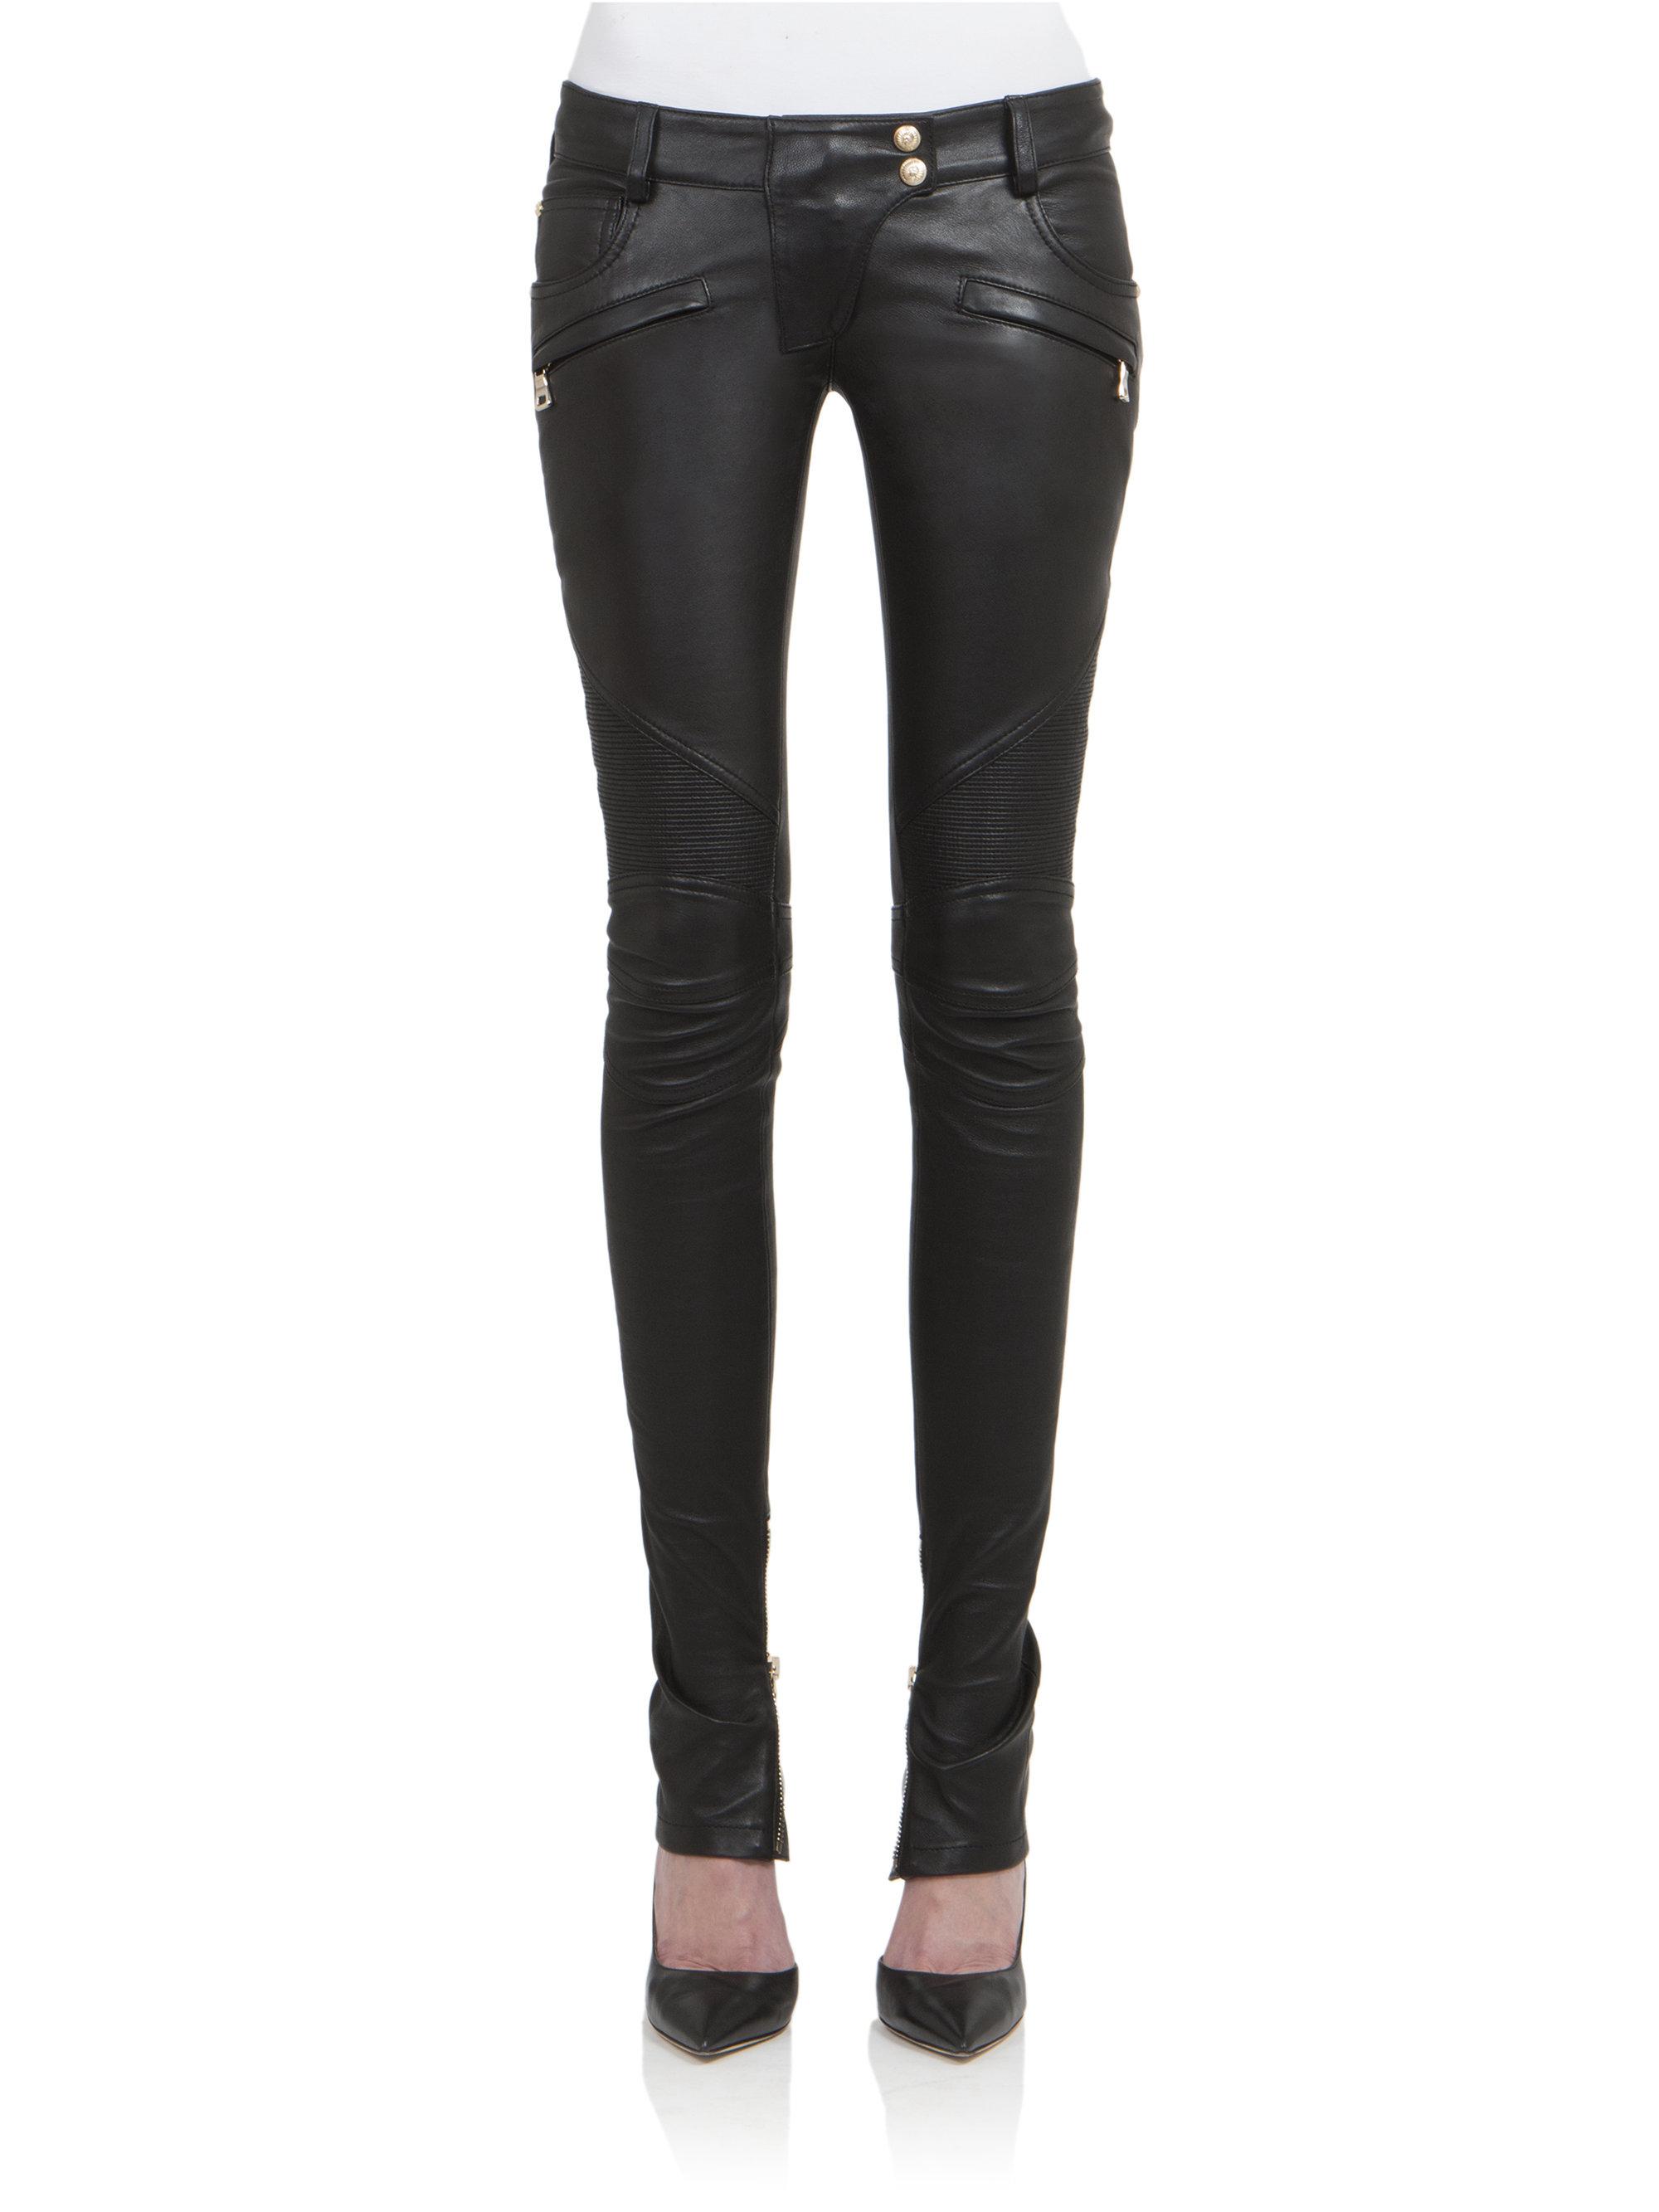 Balmain Leather Moto Pants In Black Lyst